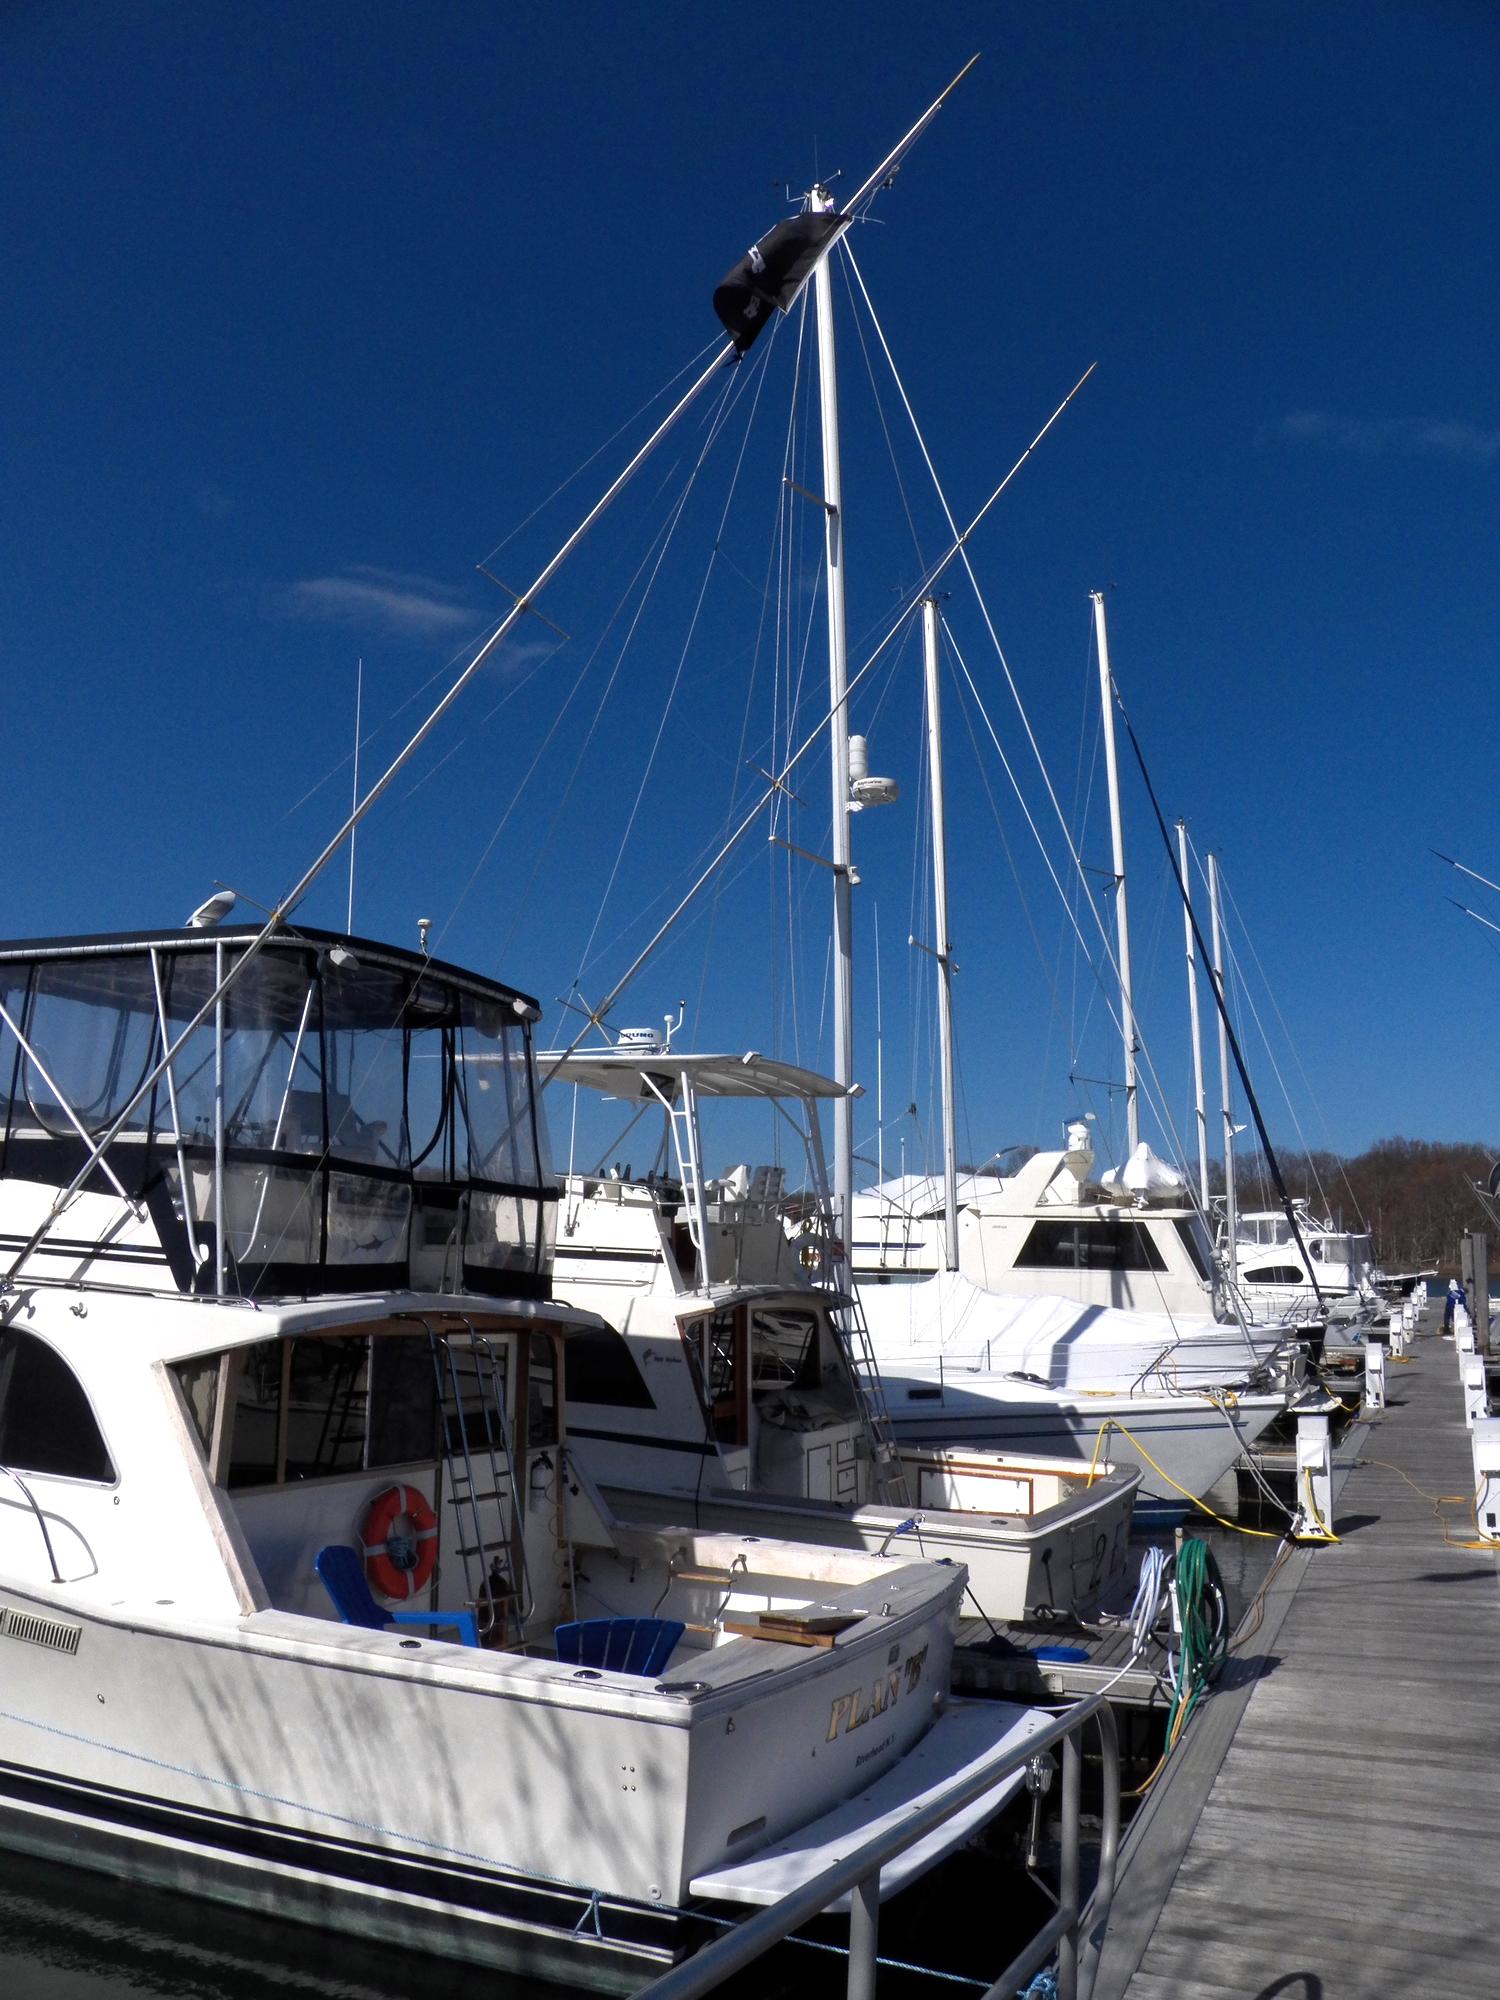 3 - All floating docks!